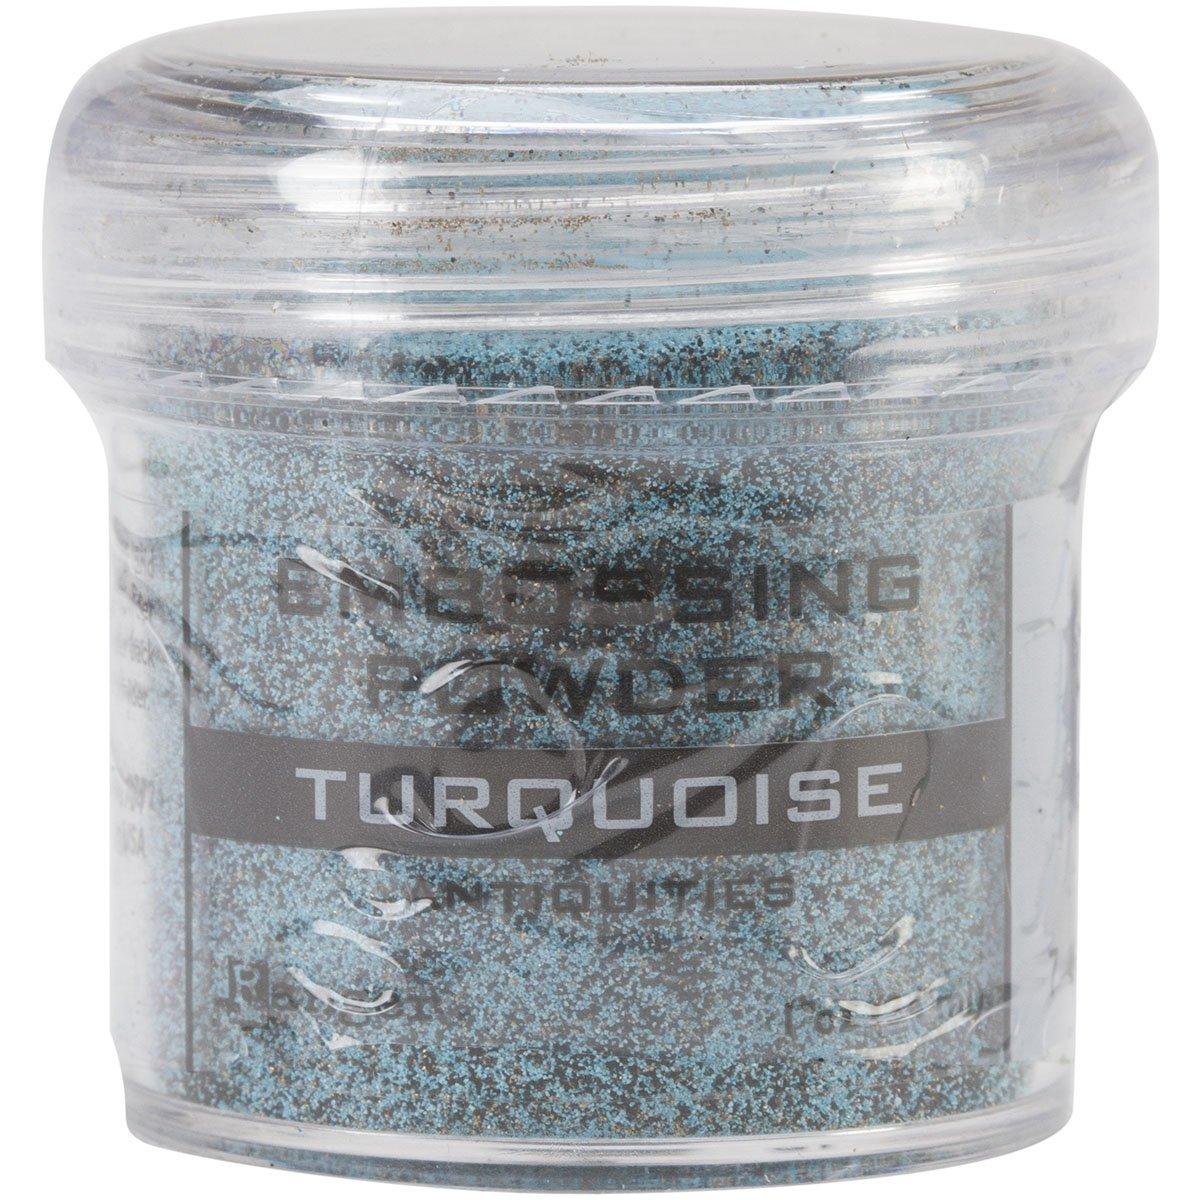 Ranger Turquoise -Embossing Powder, Acrylic, Multicolour EPJ-36692